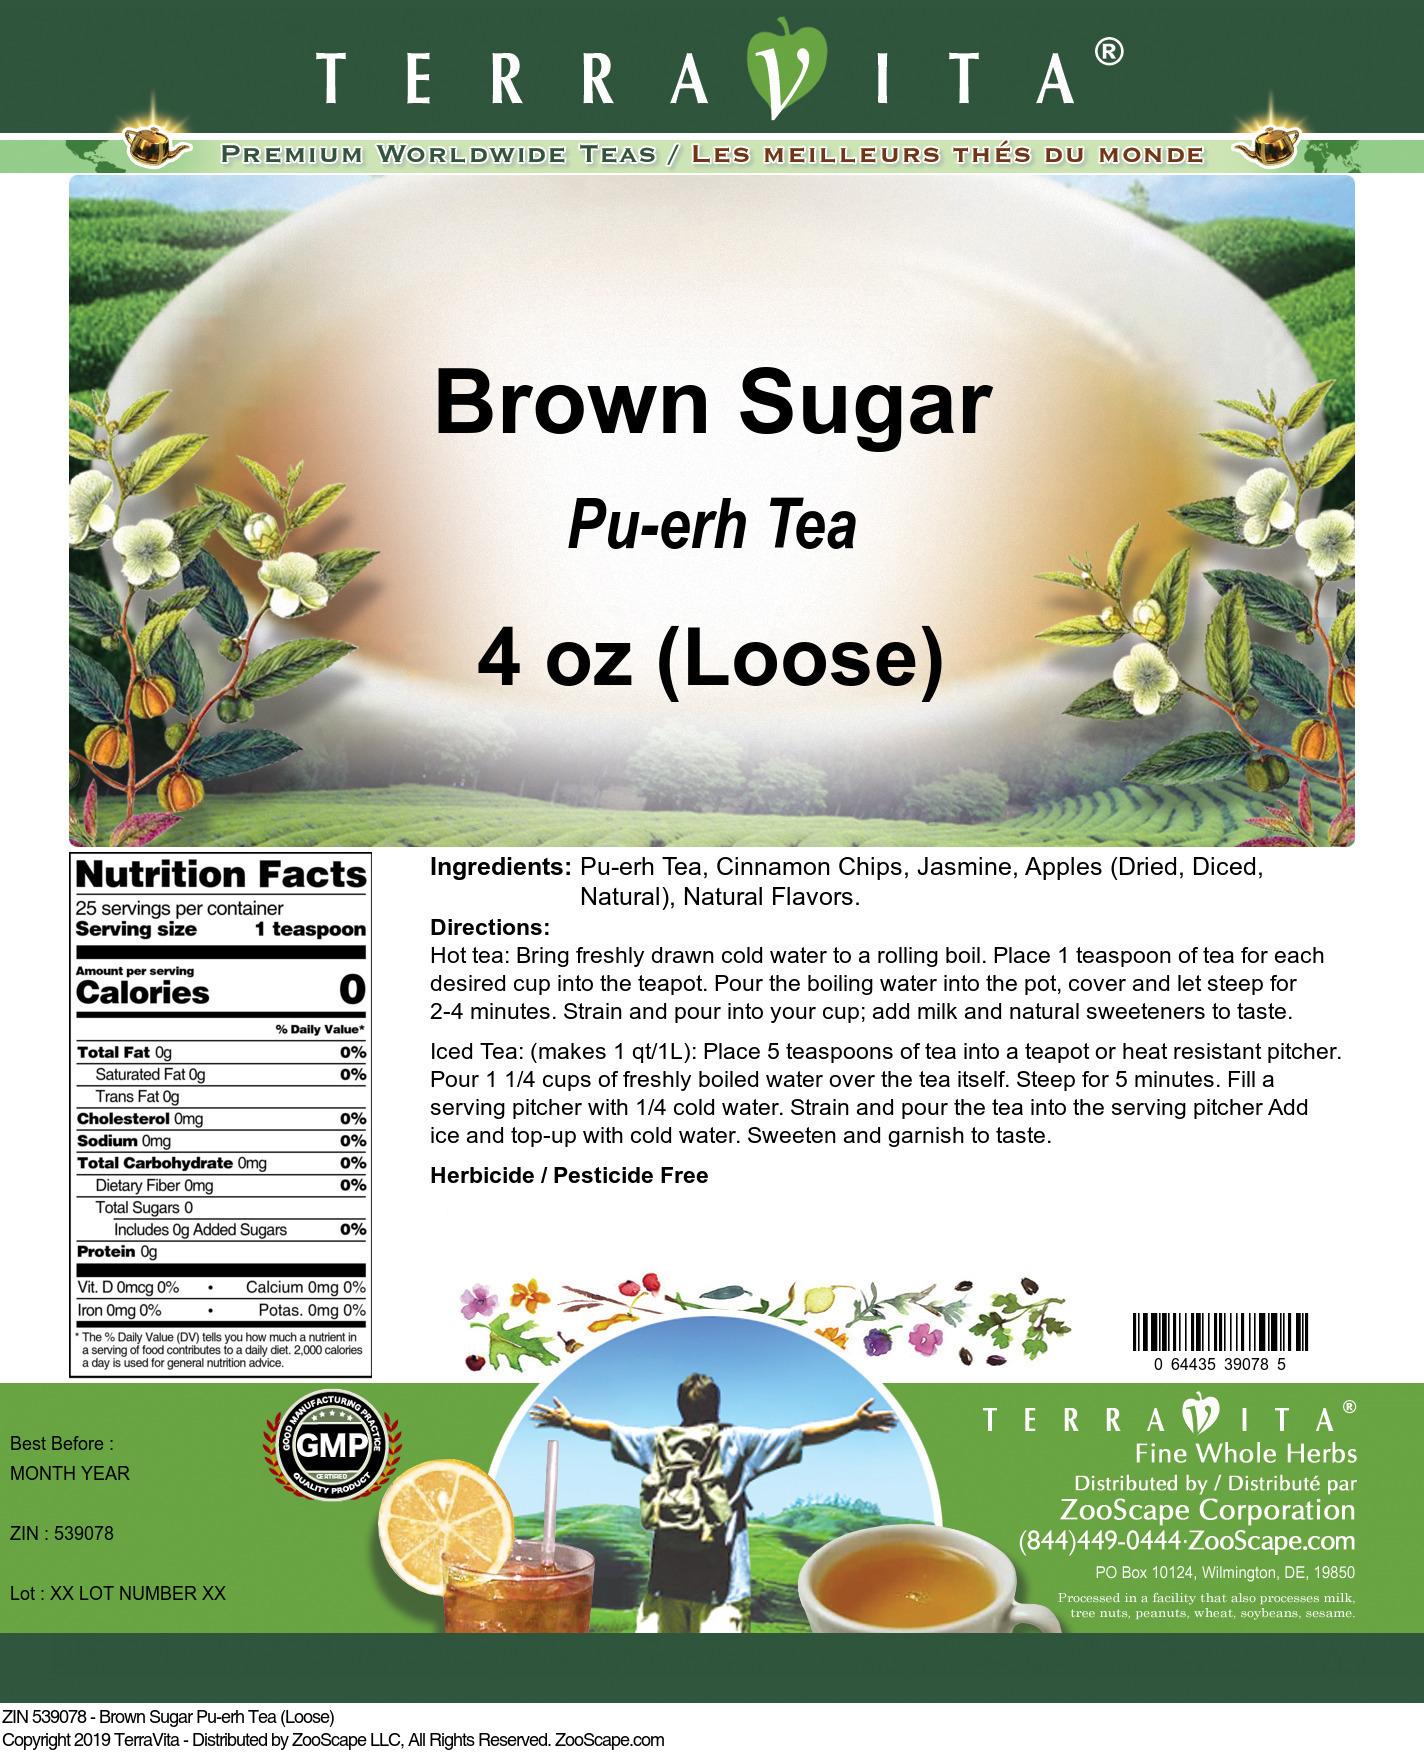 Brown Sugar Pu-erh Tea (Loose)